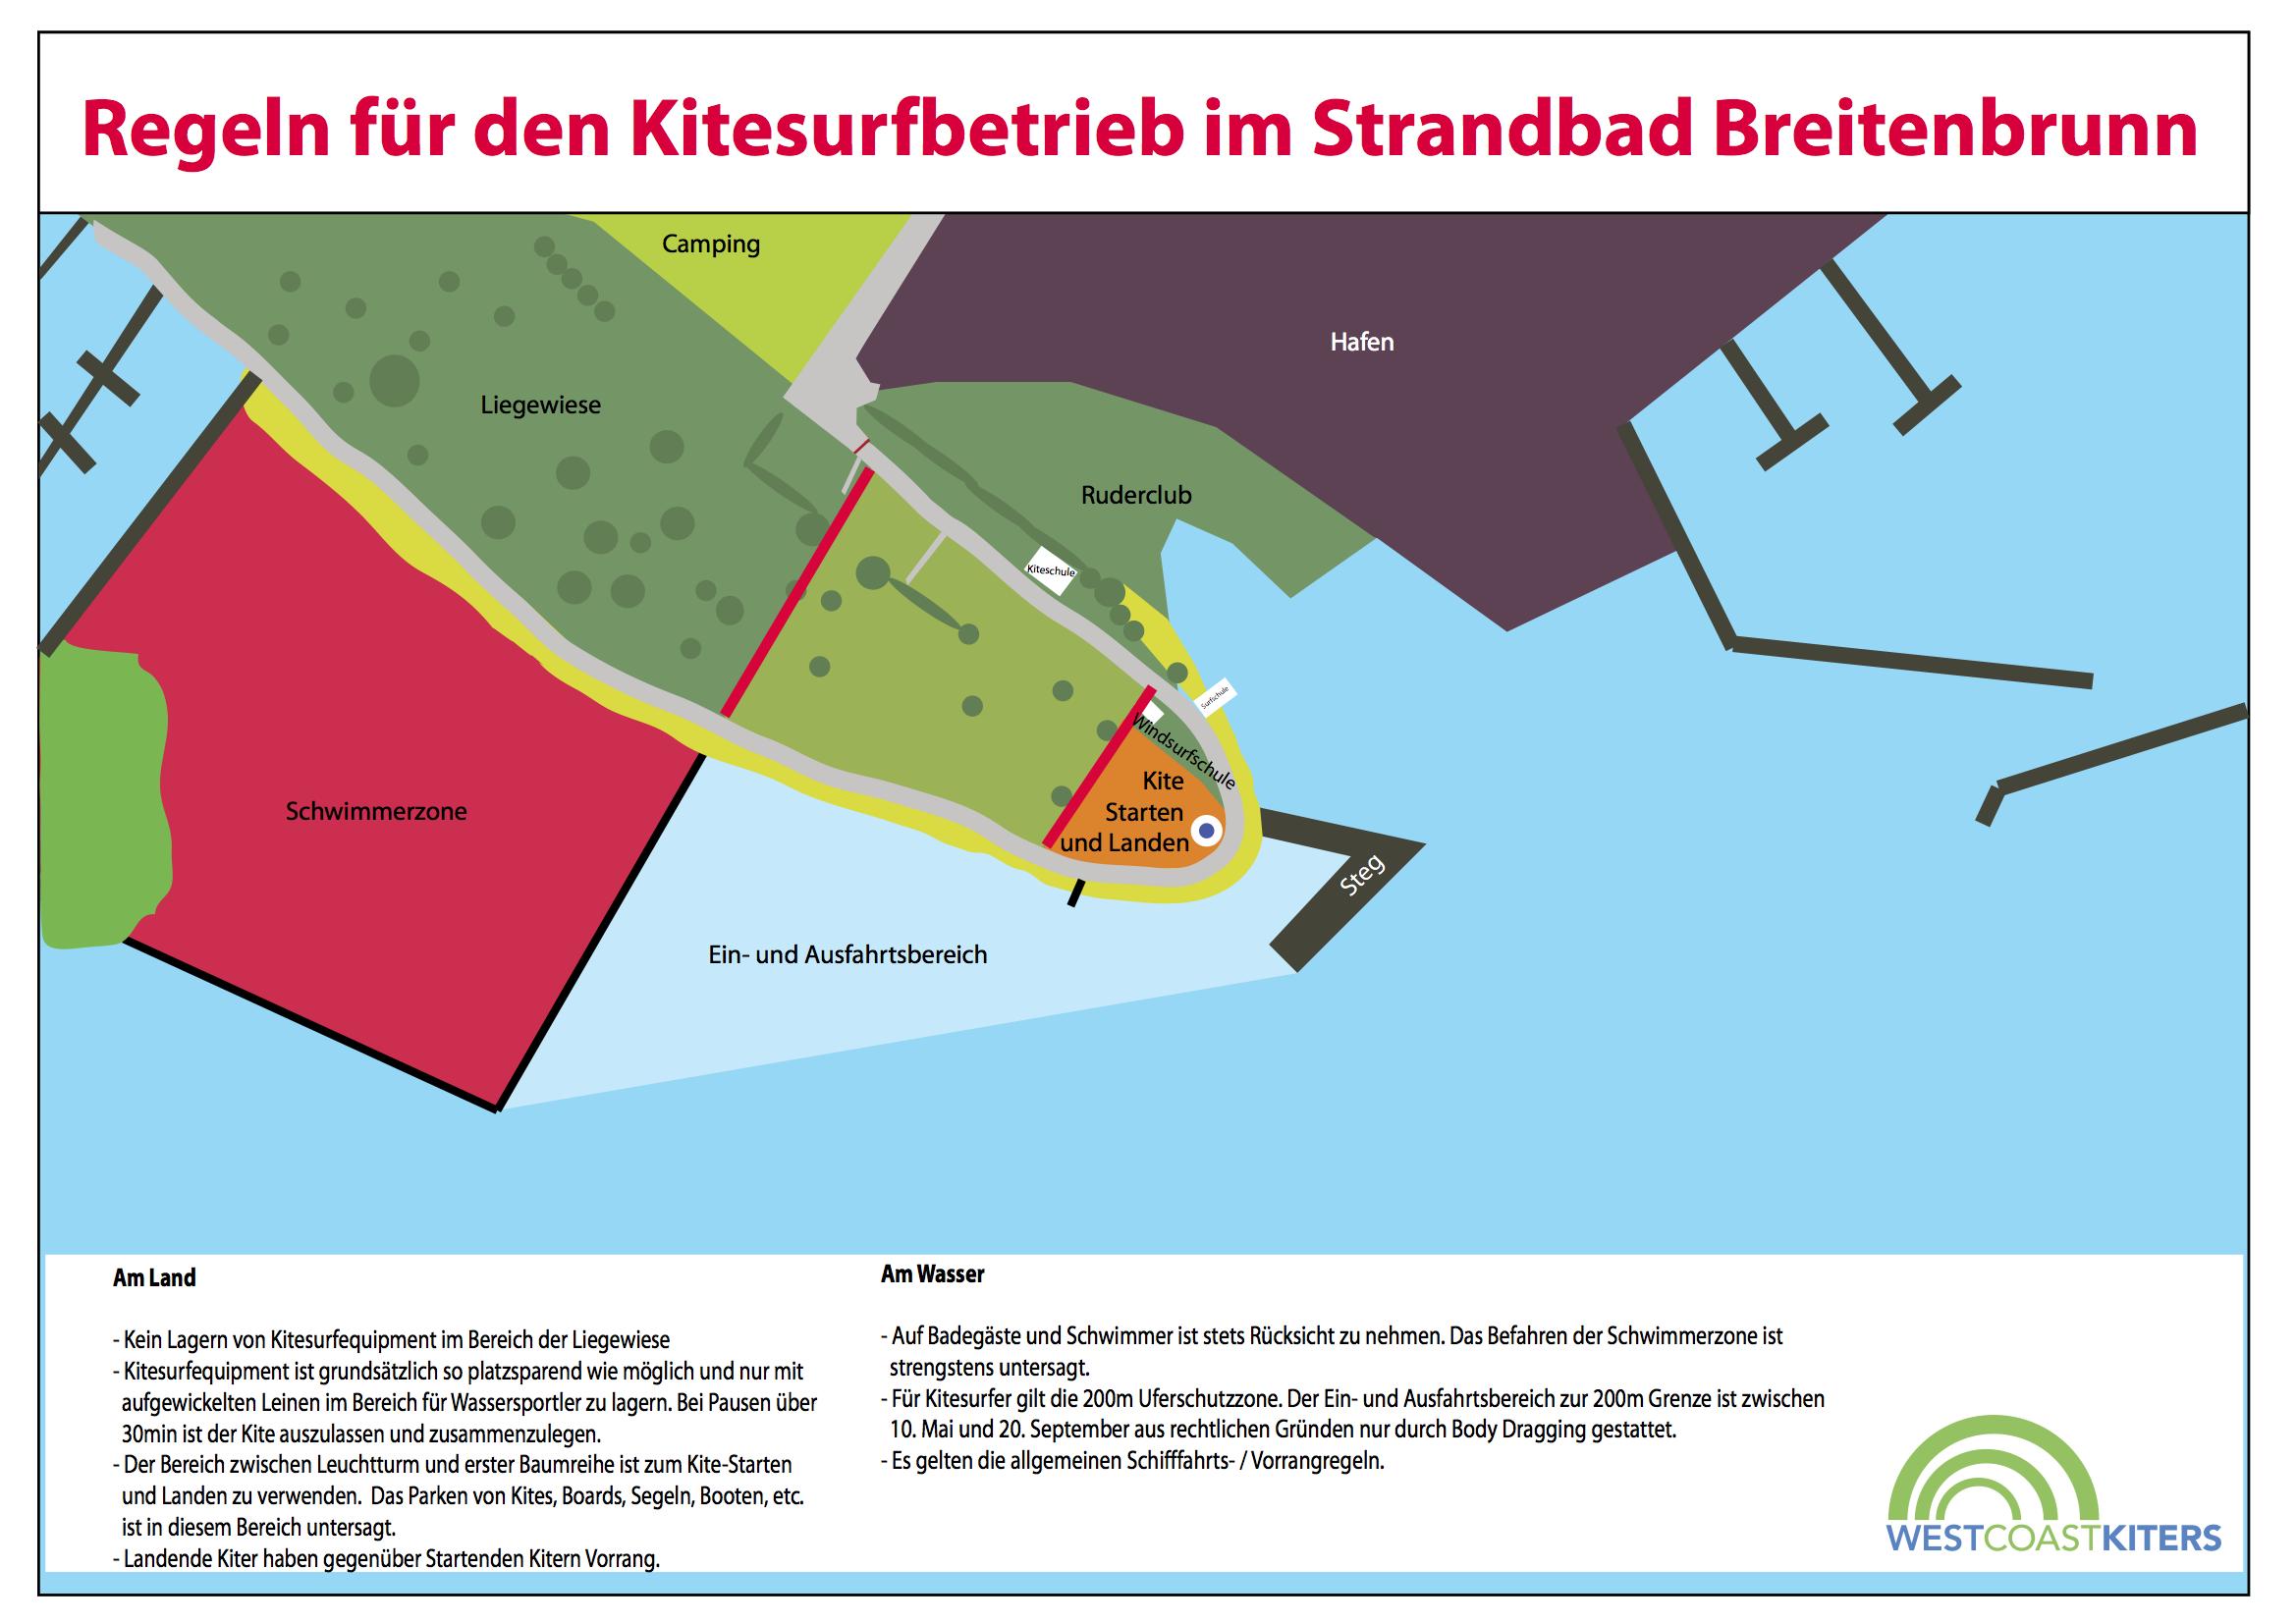 Westcoastkiters Breitenbrunn Rules